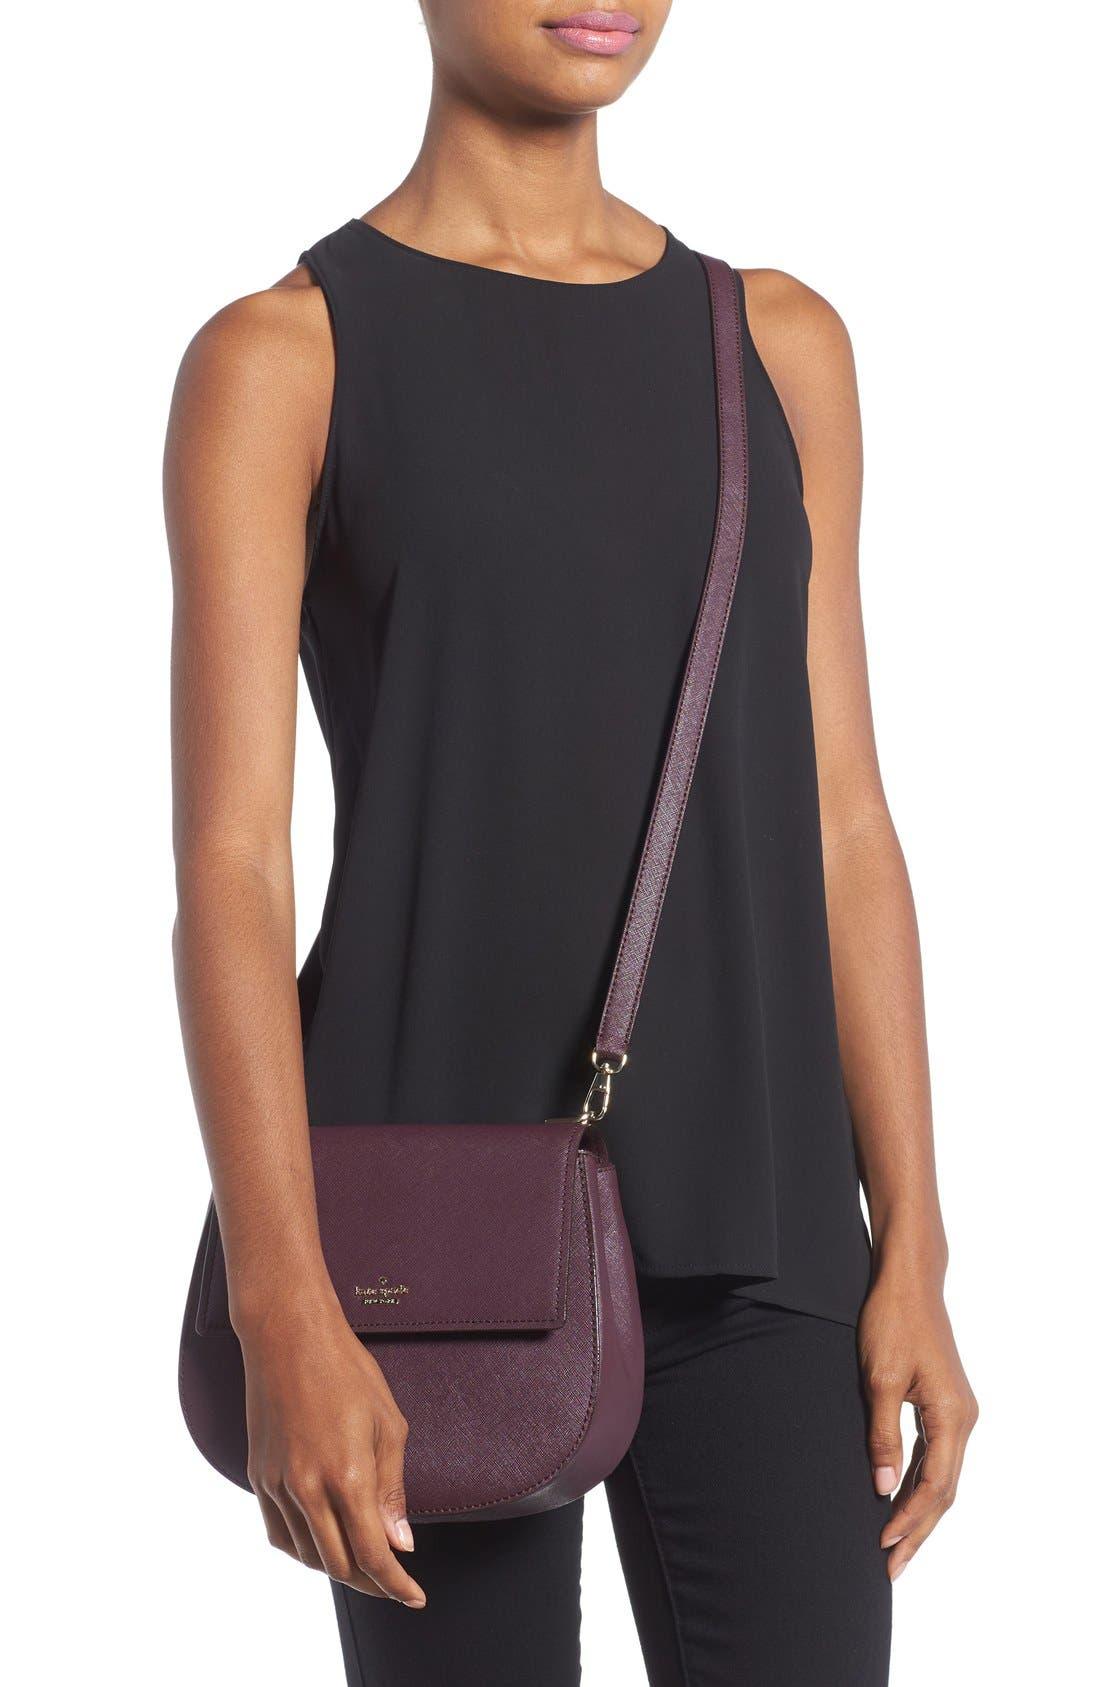 cameron street - byrdie leather crossbody bag,                             Alternate thumbnail 8, color,                             301